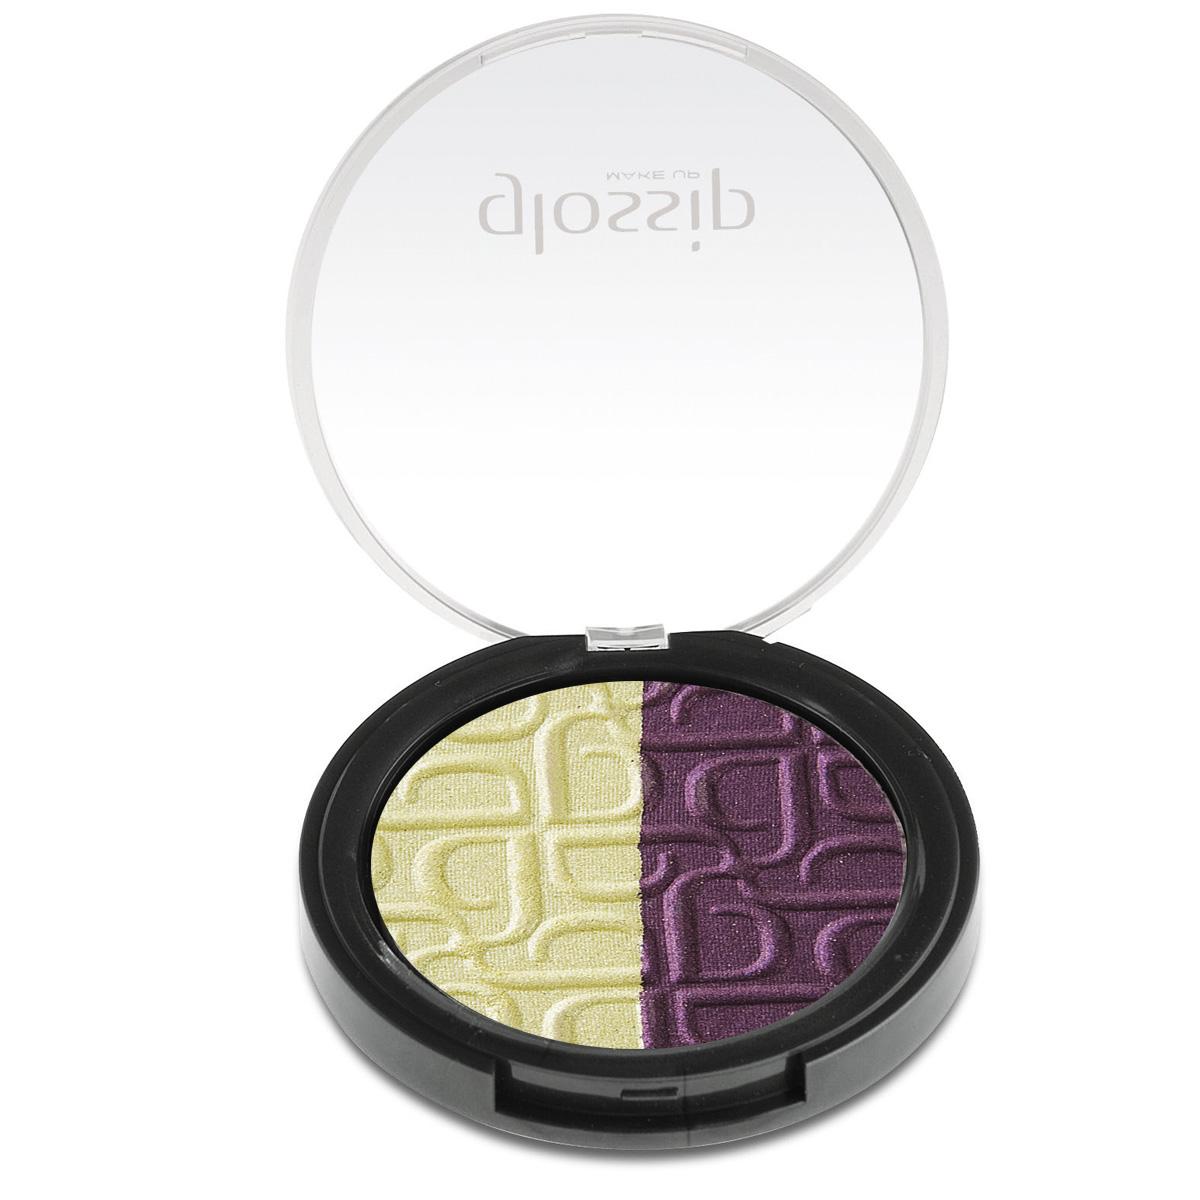 Fard de pleoape in 2 culori - Glossip